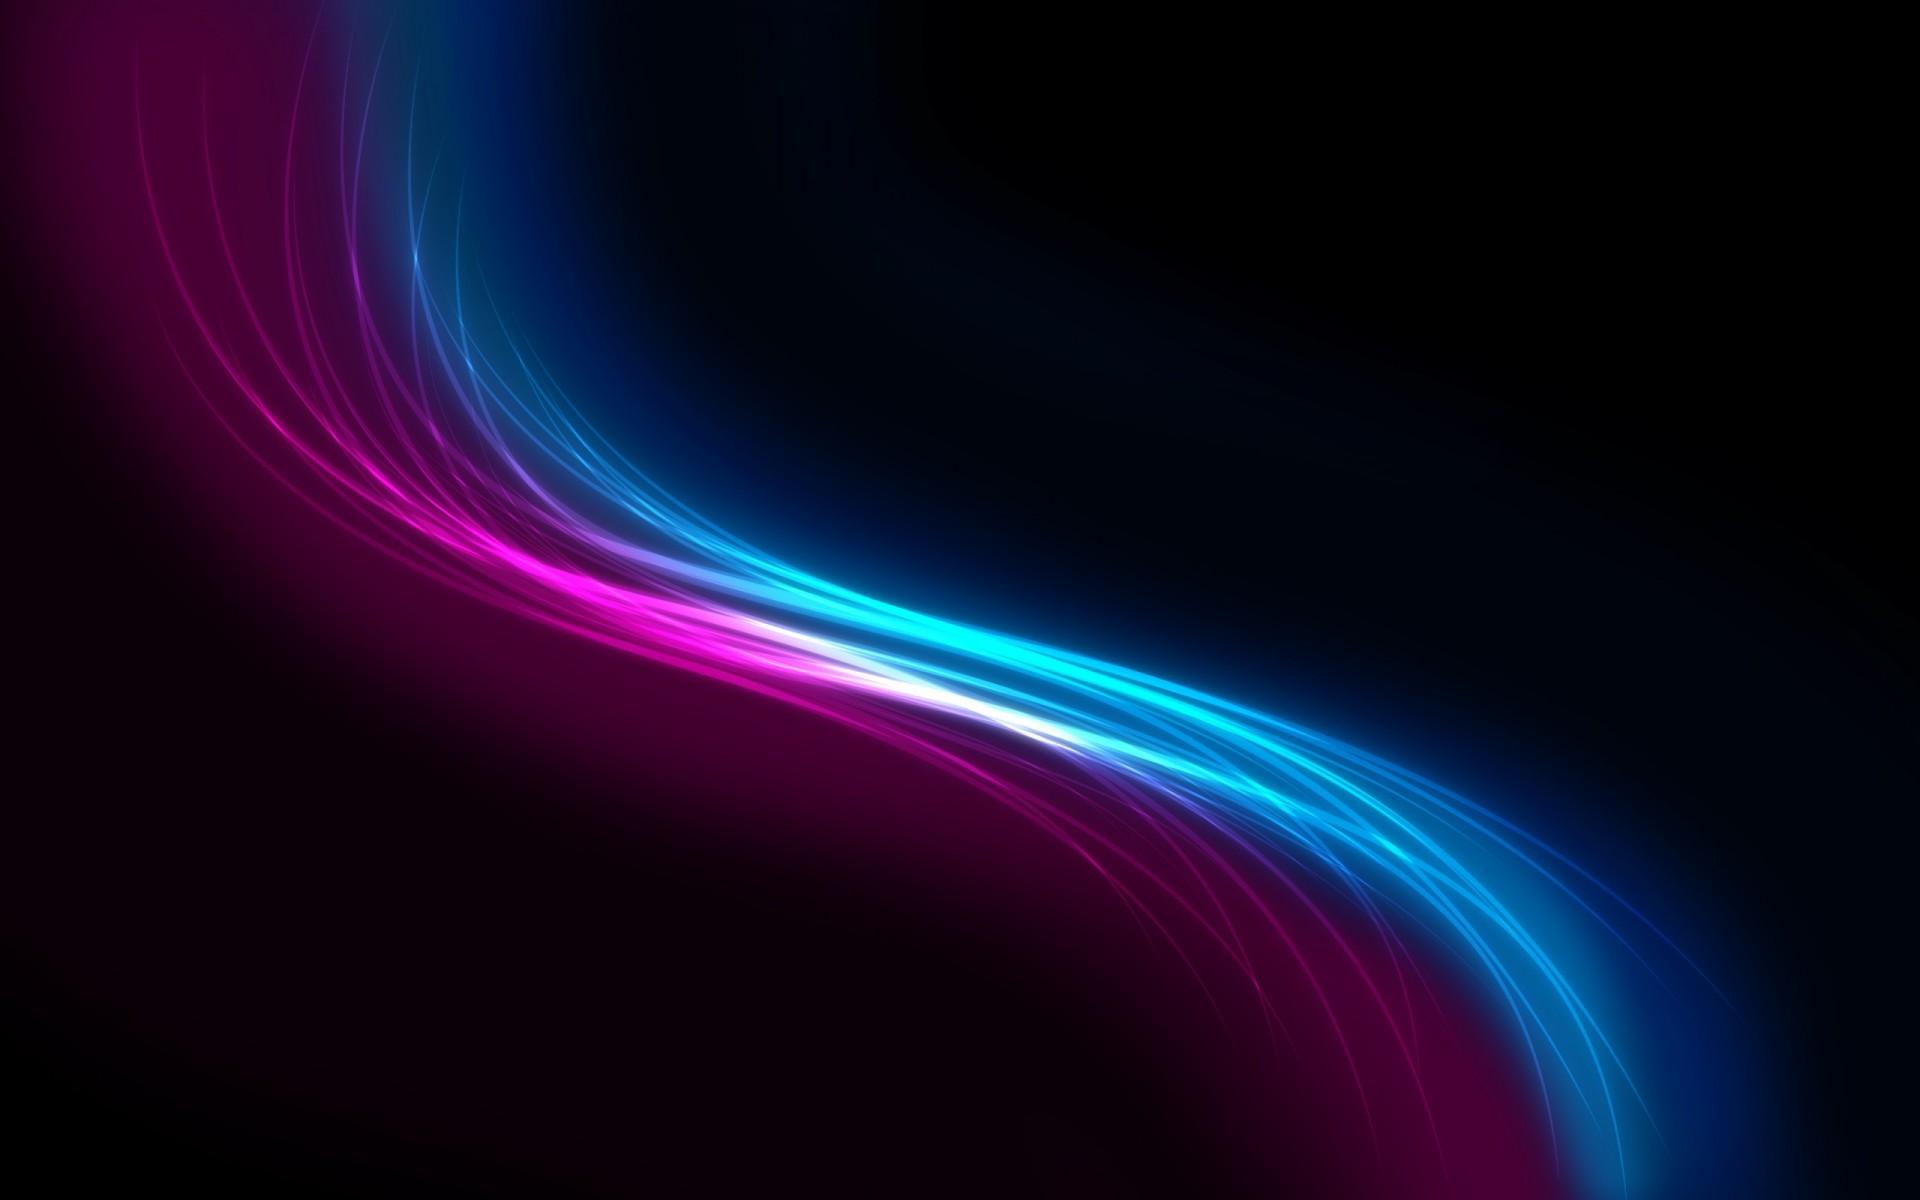 Porn sexporninjungle sexual clips